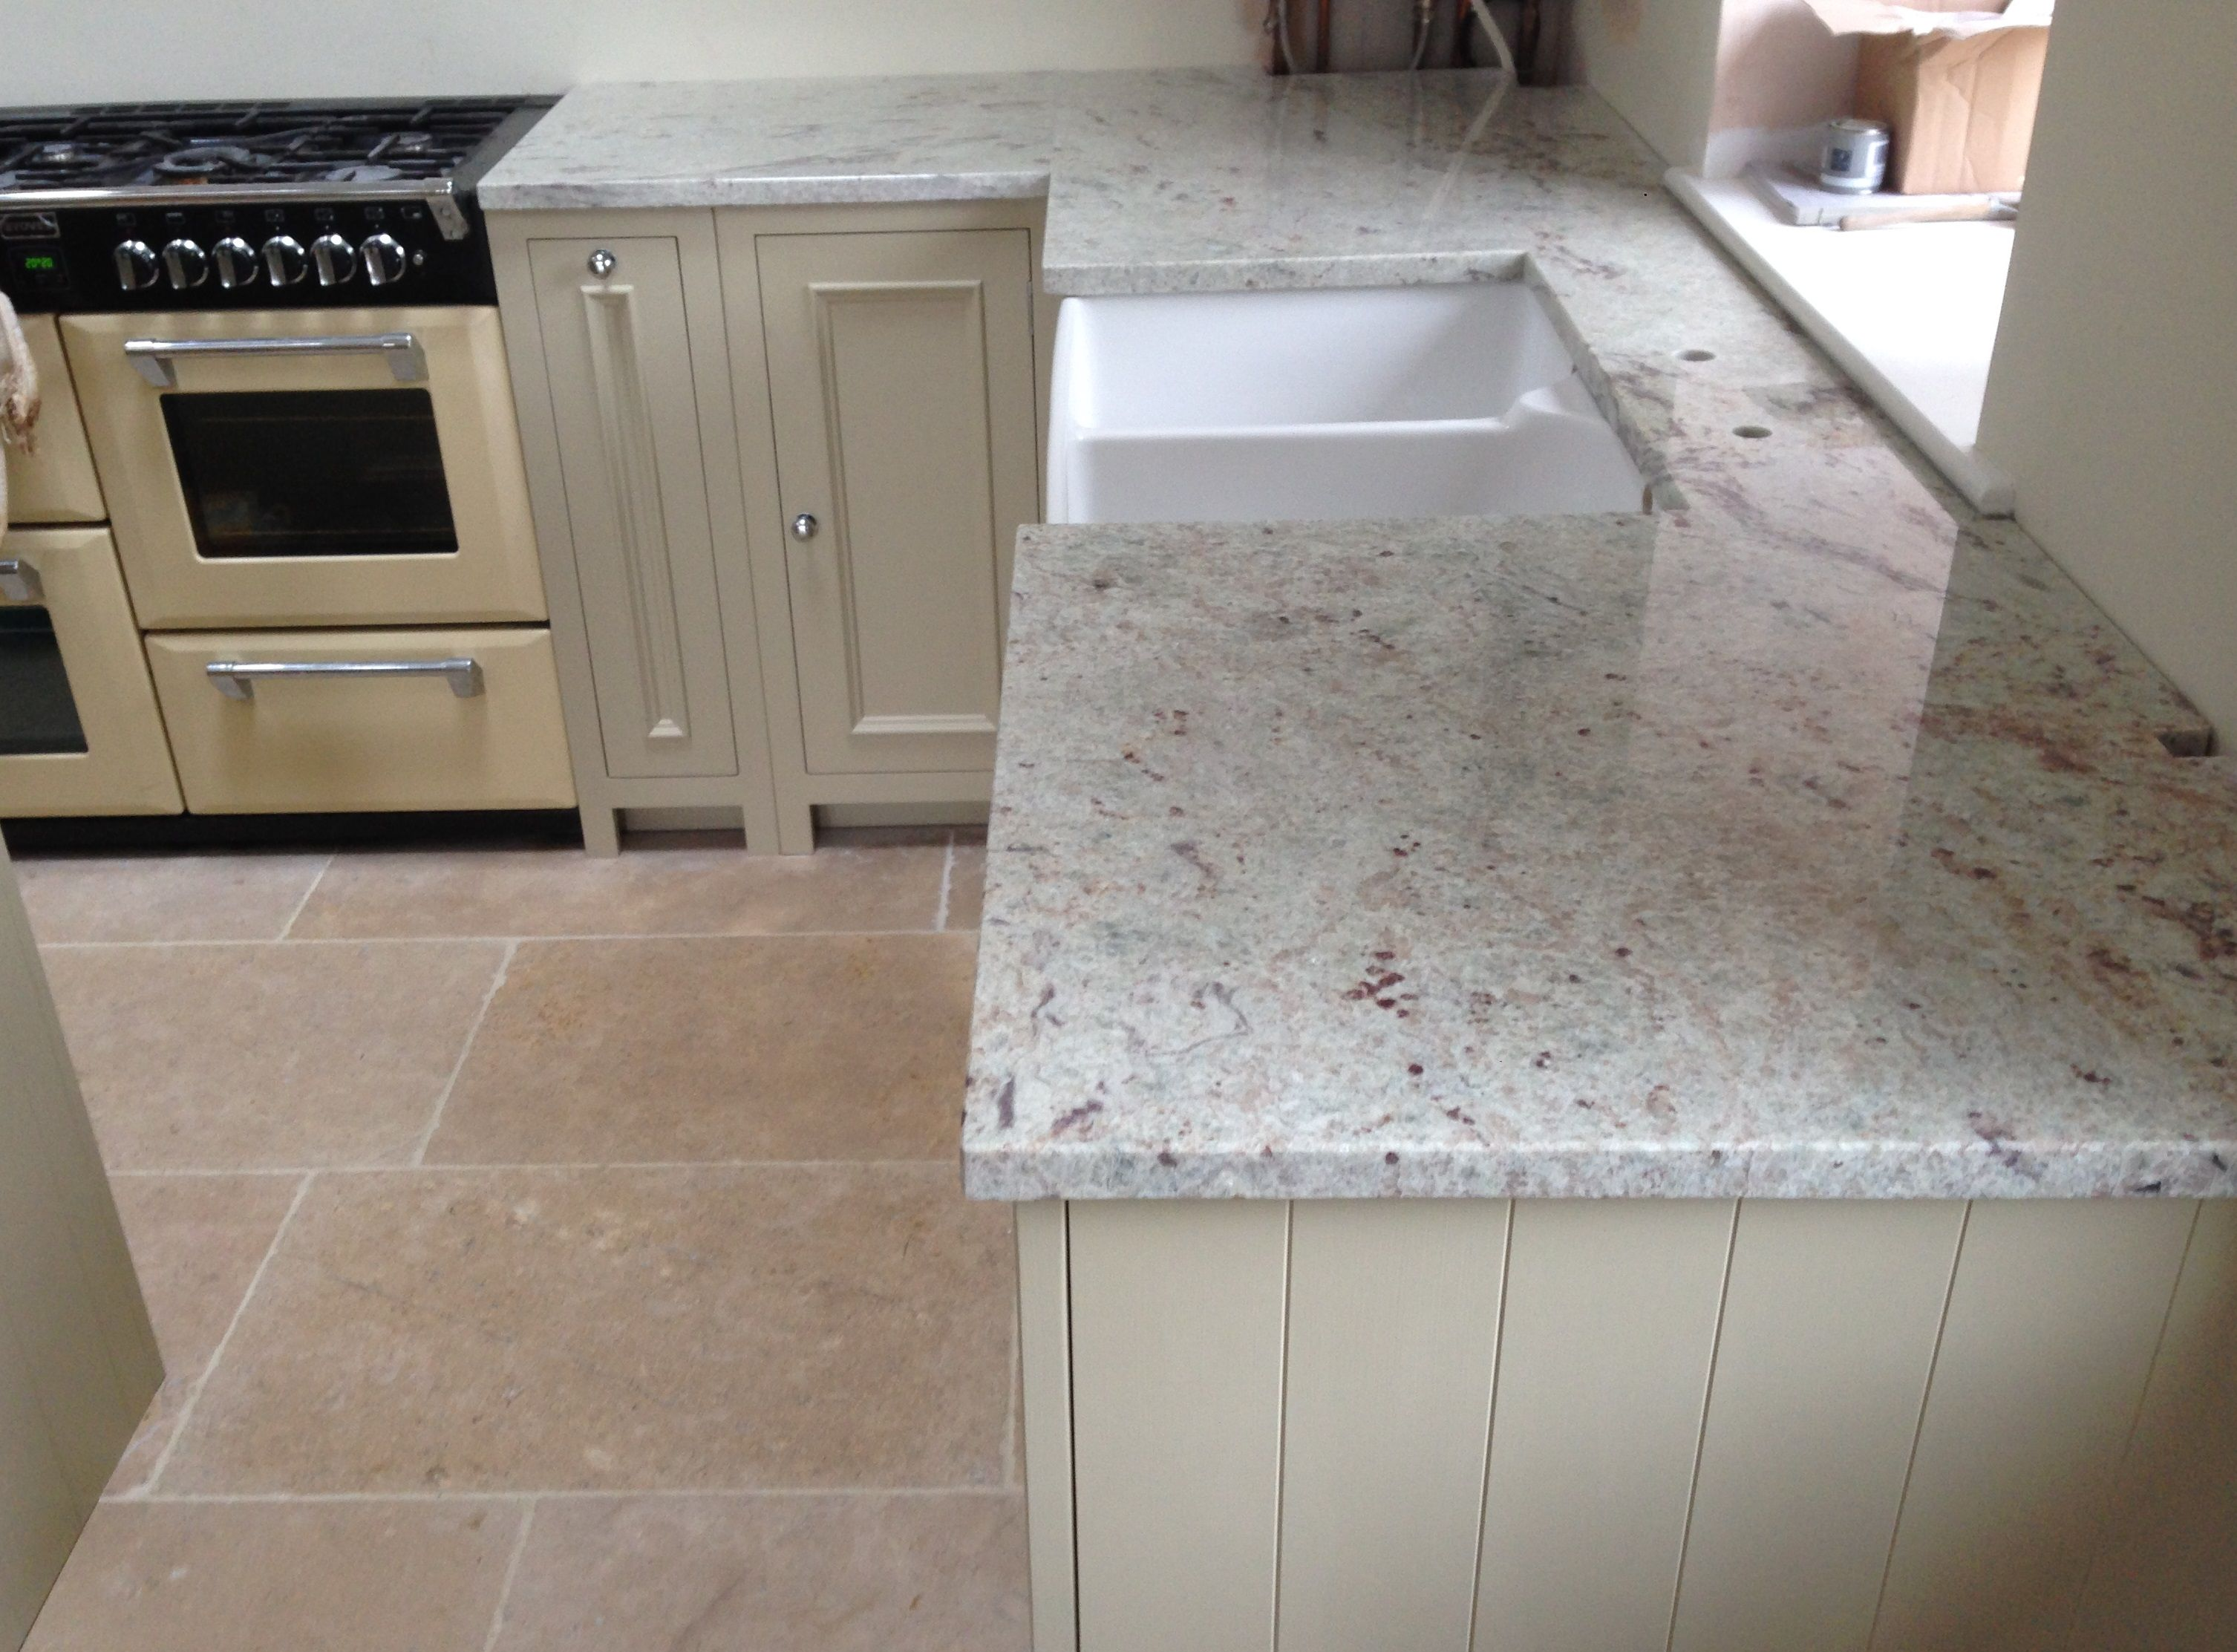 Cheshire Granite Worktops Ltd Supply Beautifully Crafted Granite And Quartz  Kitchen Worktops Across Cheshire, Manchester, Warrington, Crewe And  Liverpool.